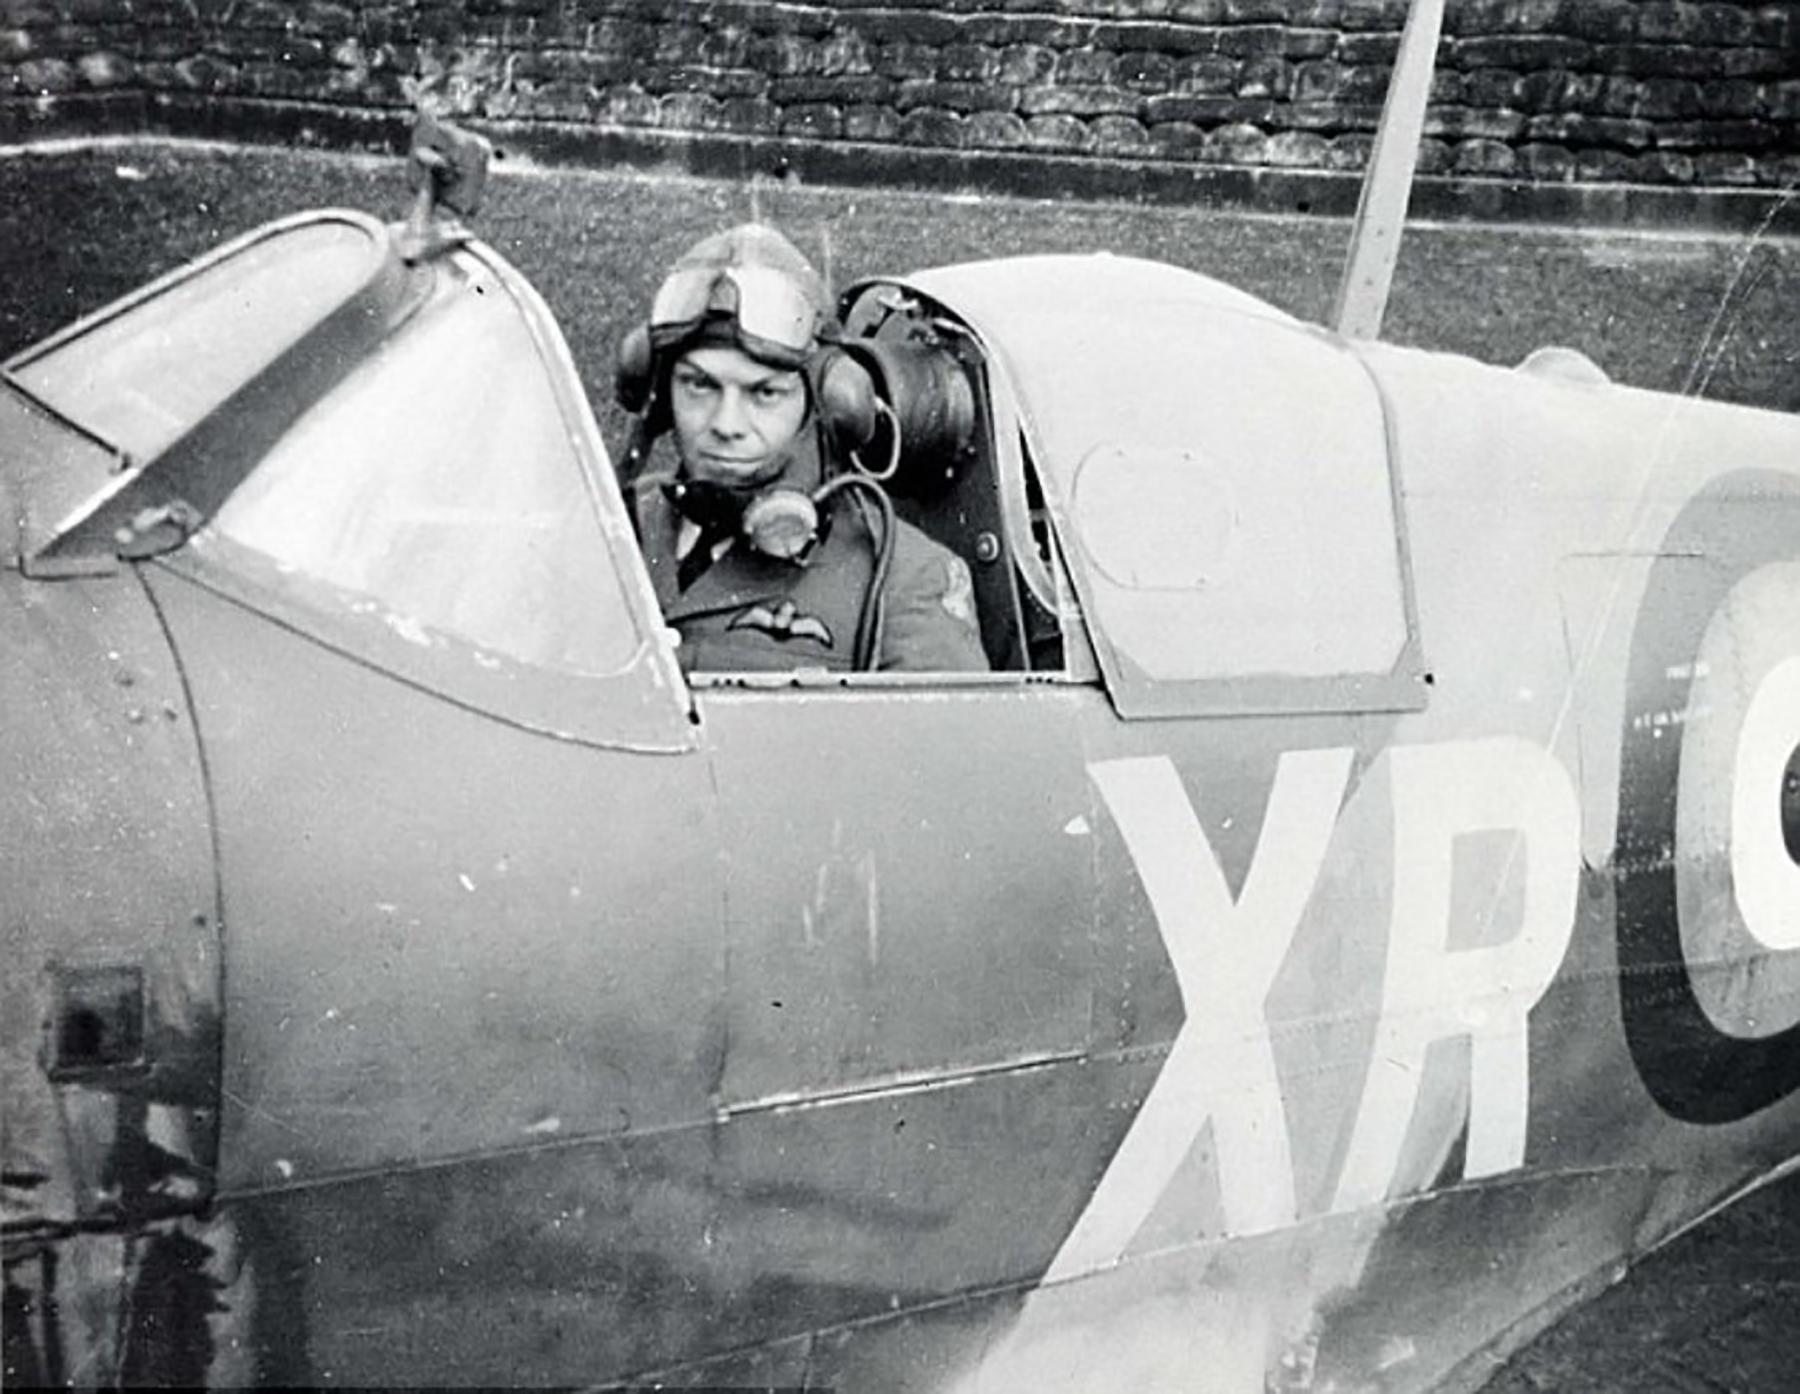 Spitfire MkVb RAF 71Sqn XRD Bill Dunn P7308 North Weald 1941 01